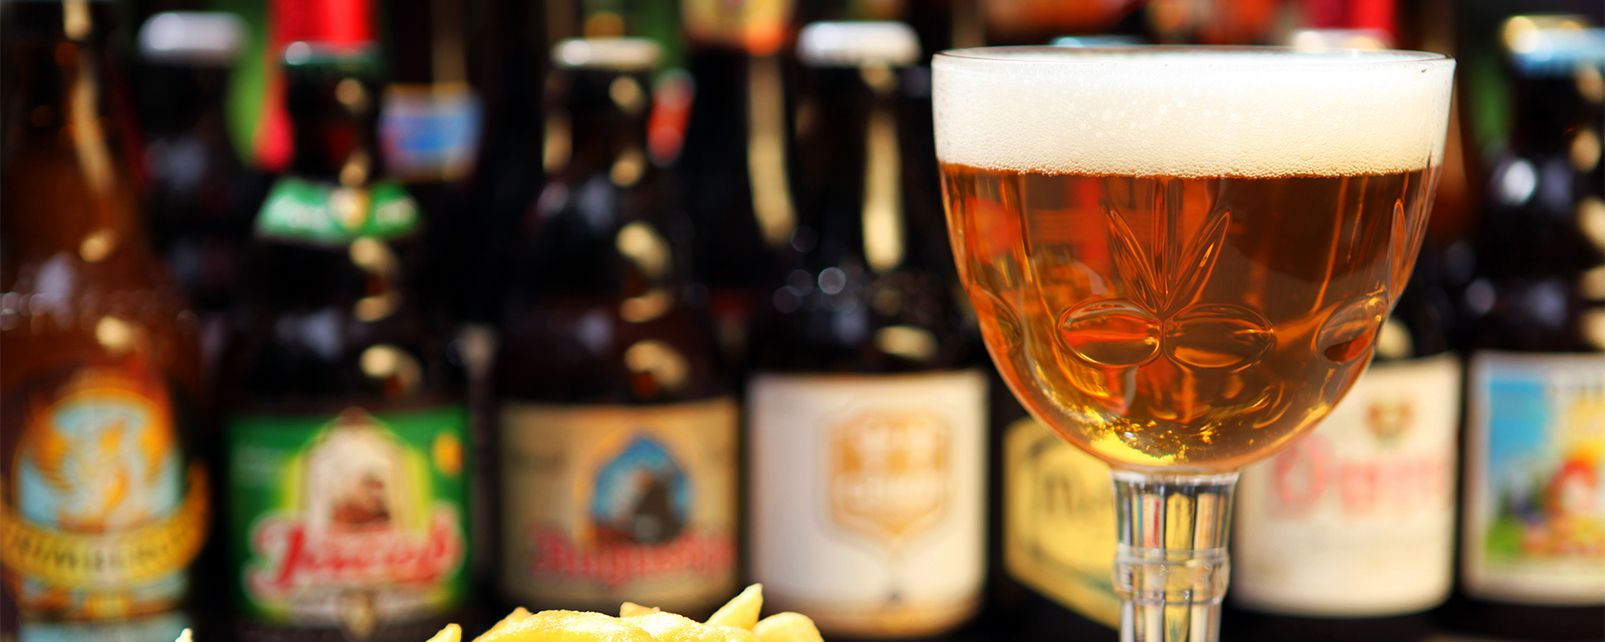 Das Bier, Belgisches Bier, Das Shopping, Belgien